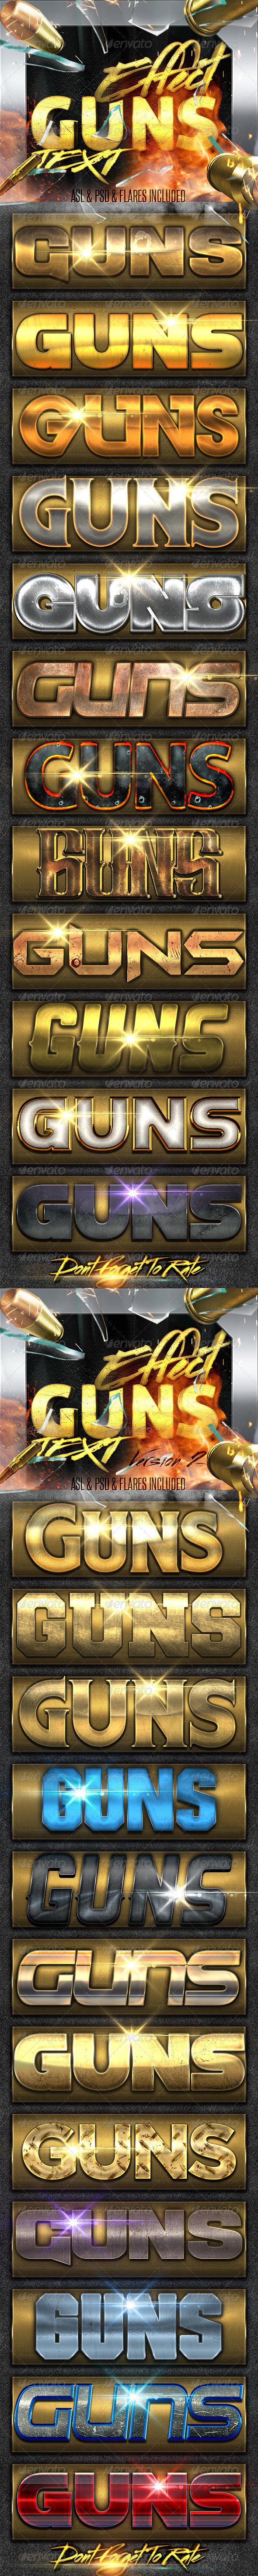 GraphicRiver Guns Styles Bundle 8145919